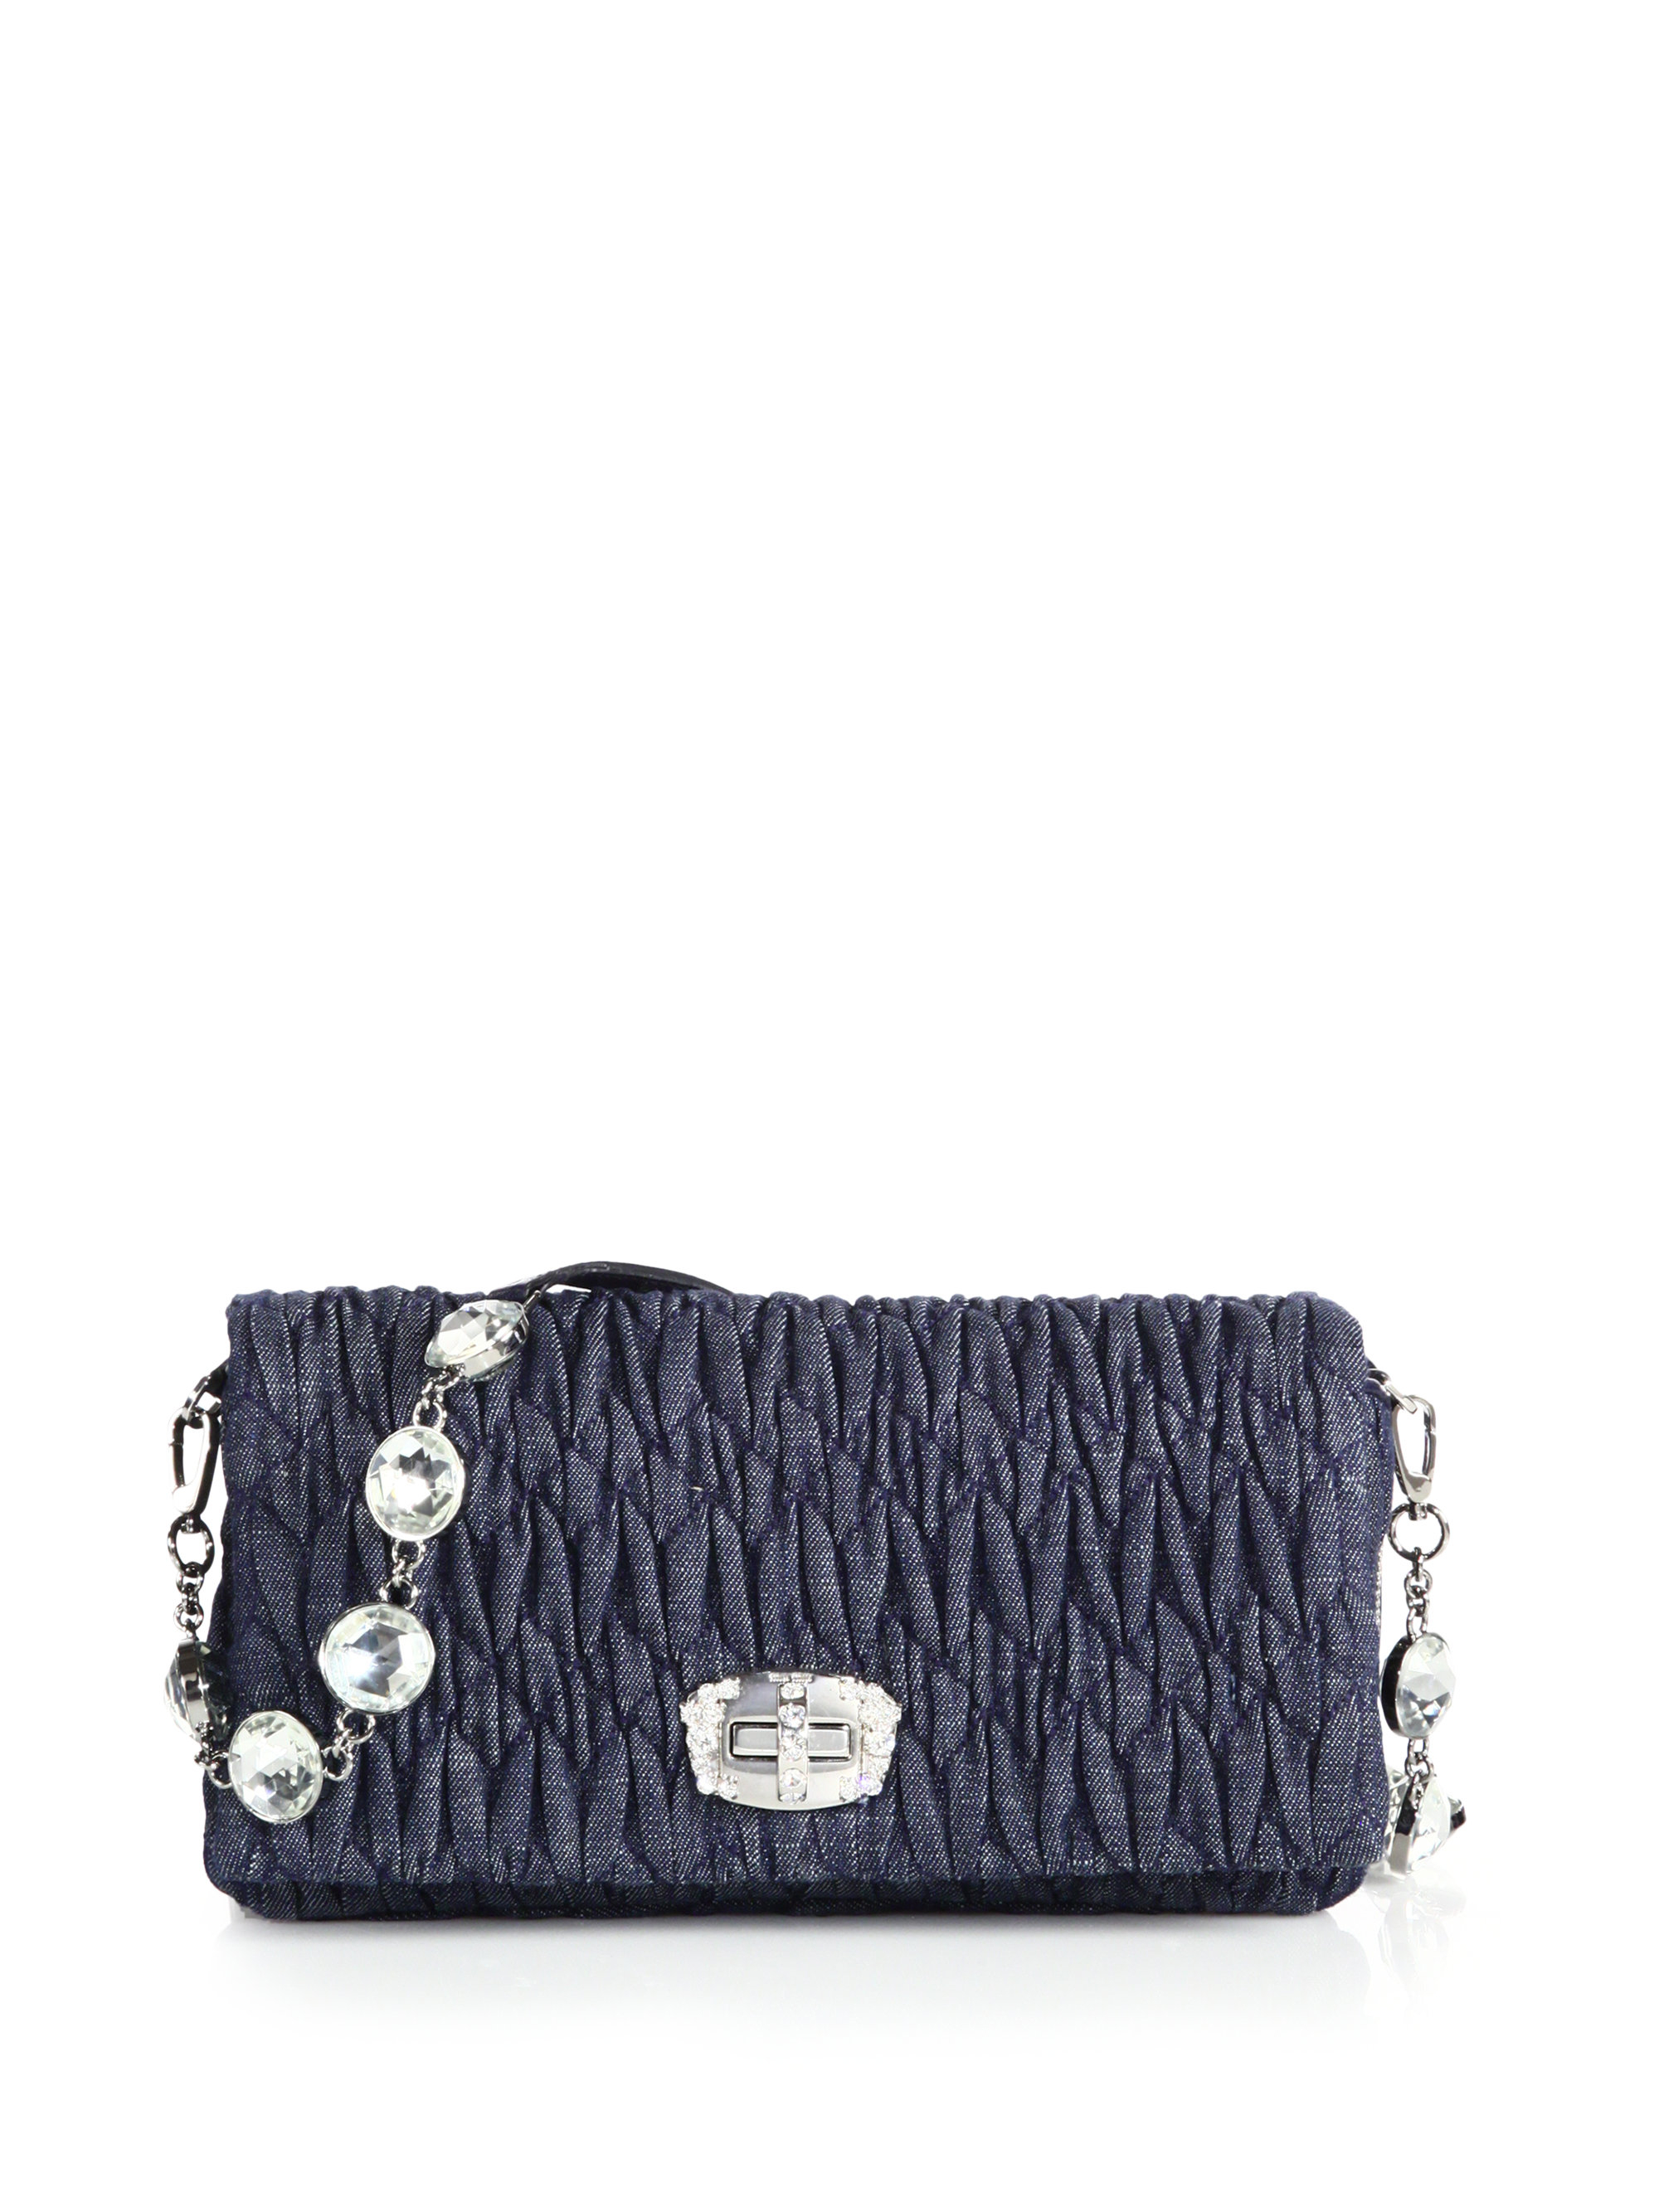 f3720f8312c Miu miu Woven Leather Chain Strap Bag in Blue